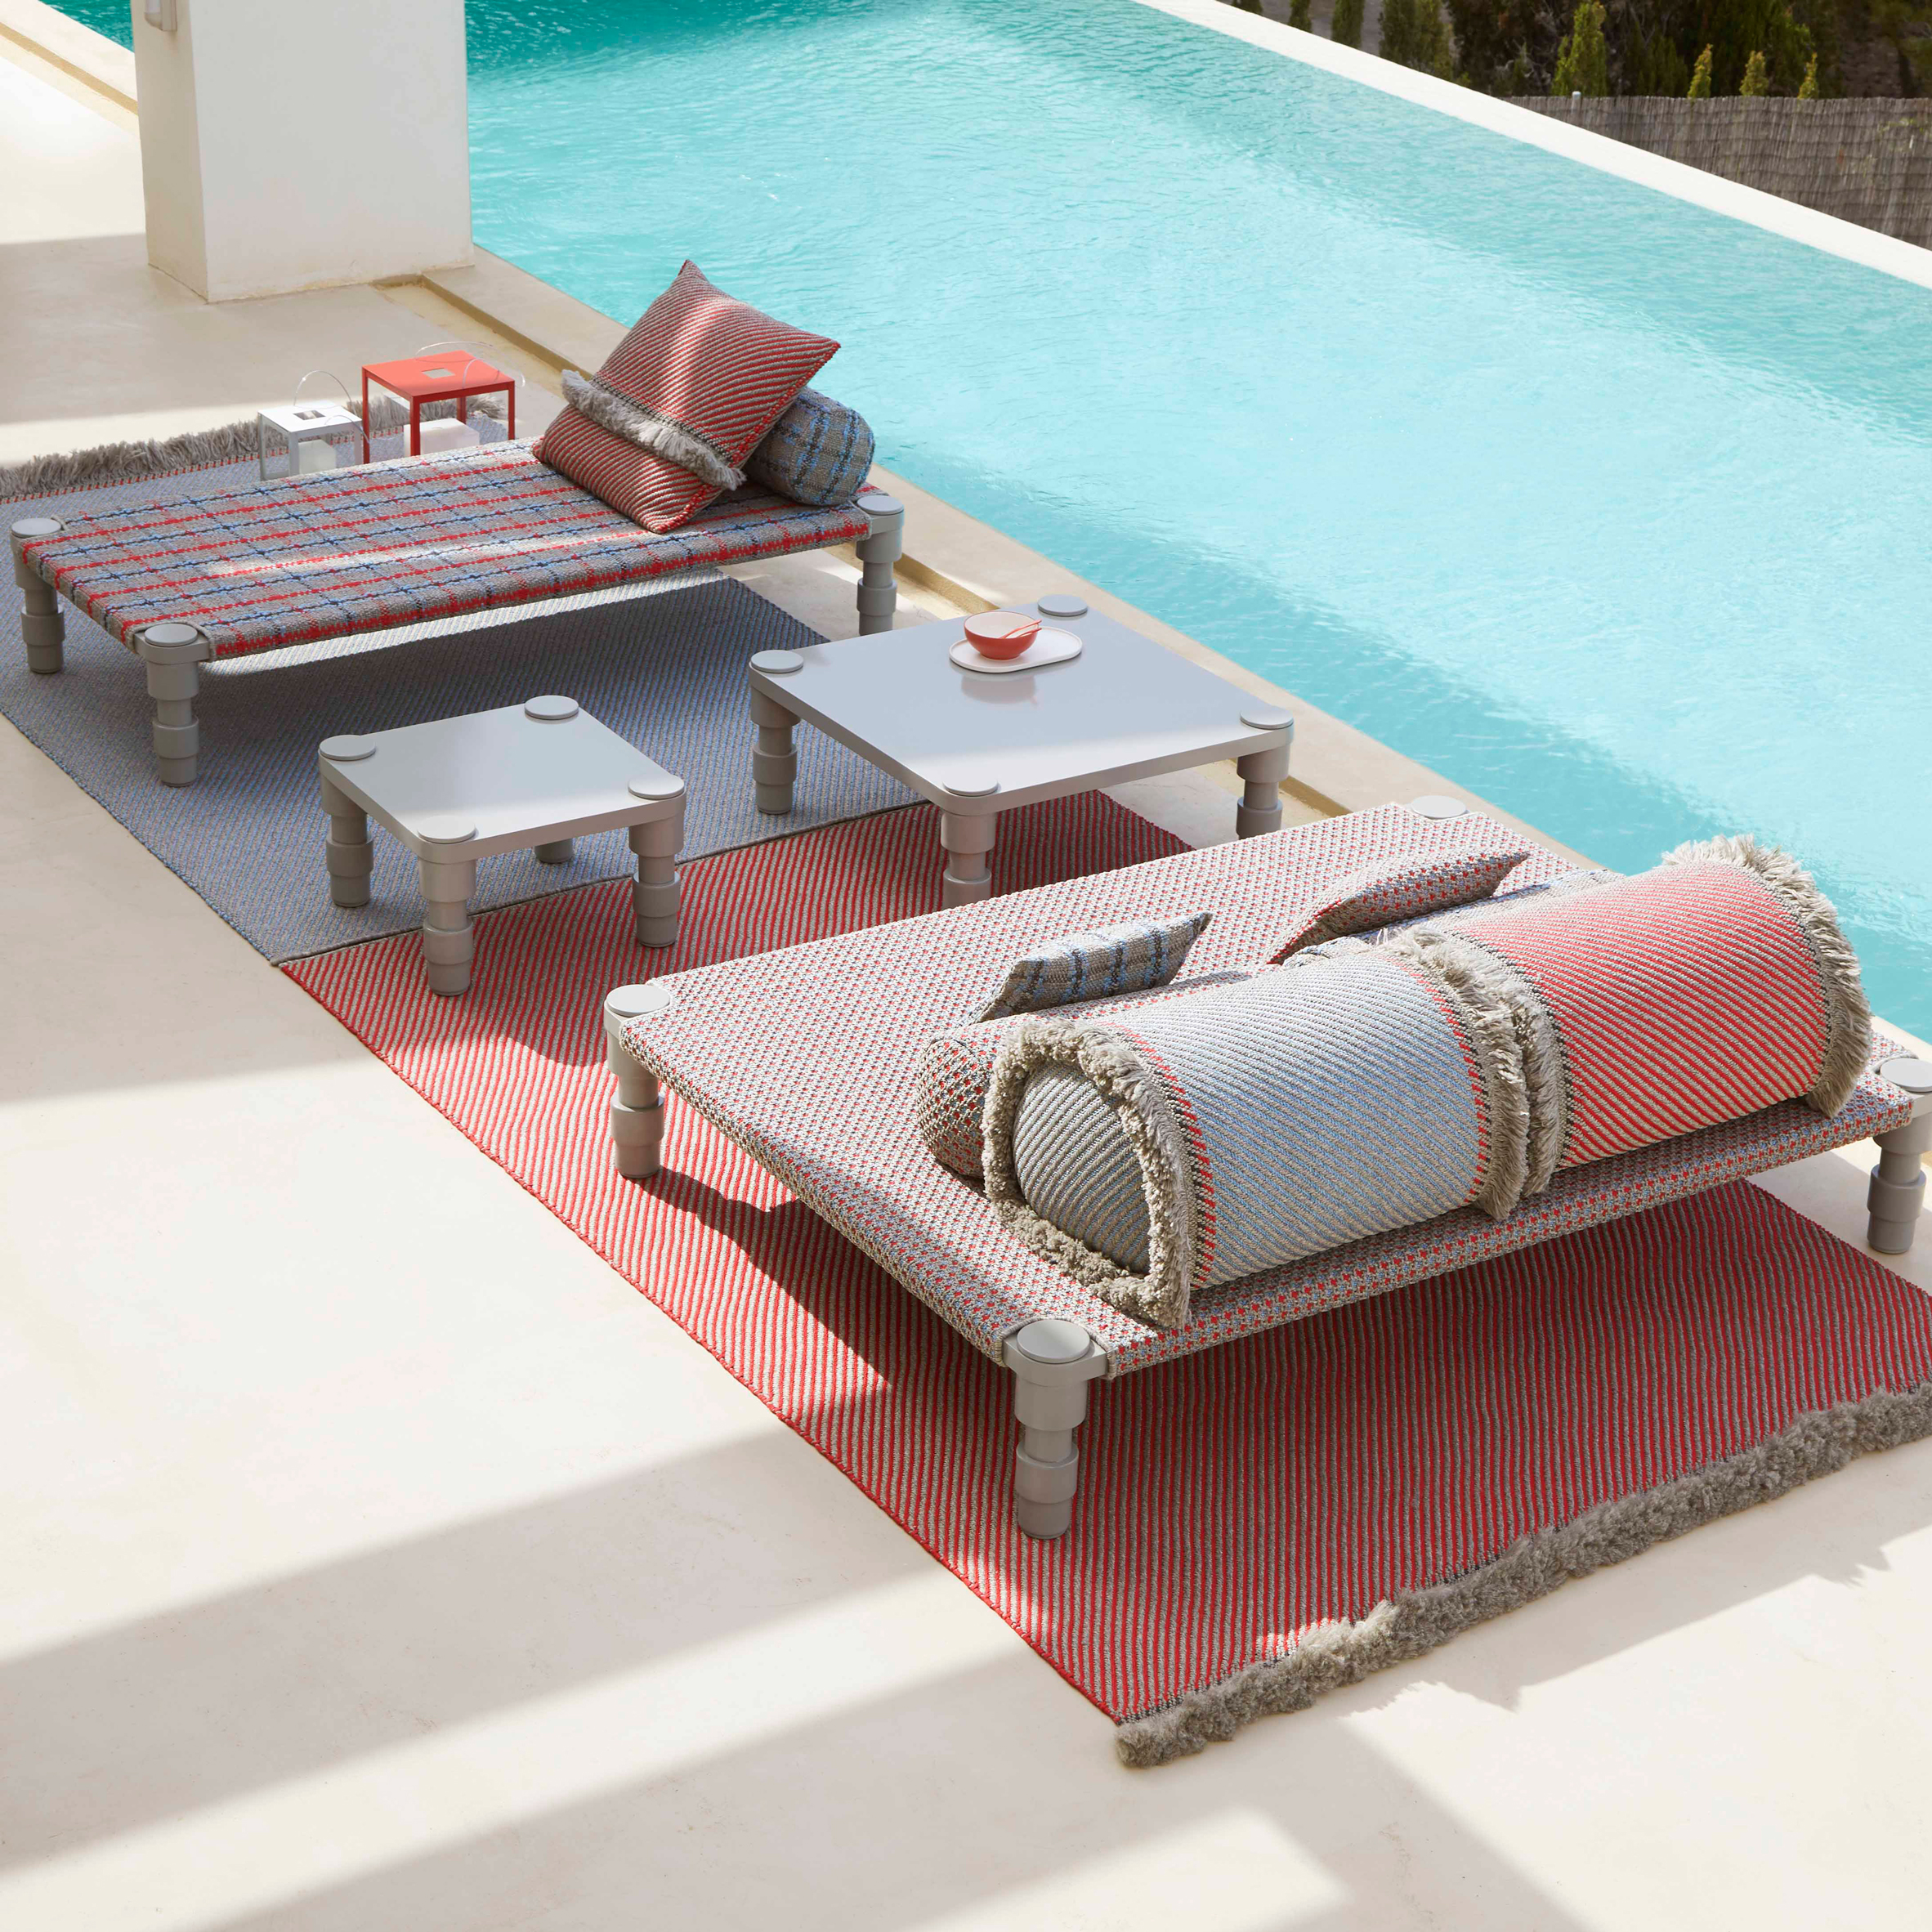 Garden Layers outdoor furnishings by Patricia Urquiola for Gan